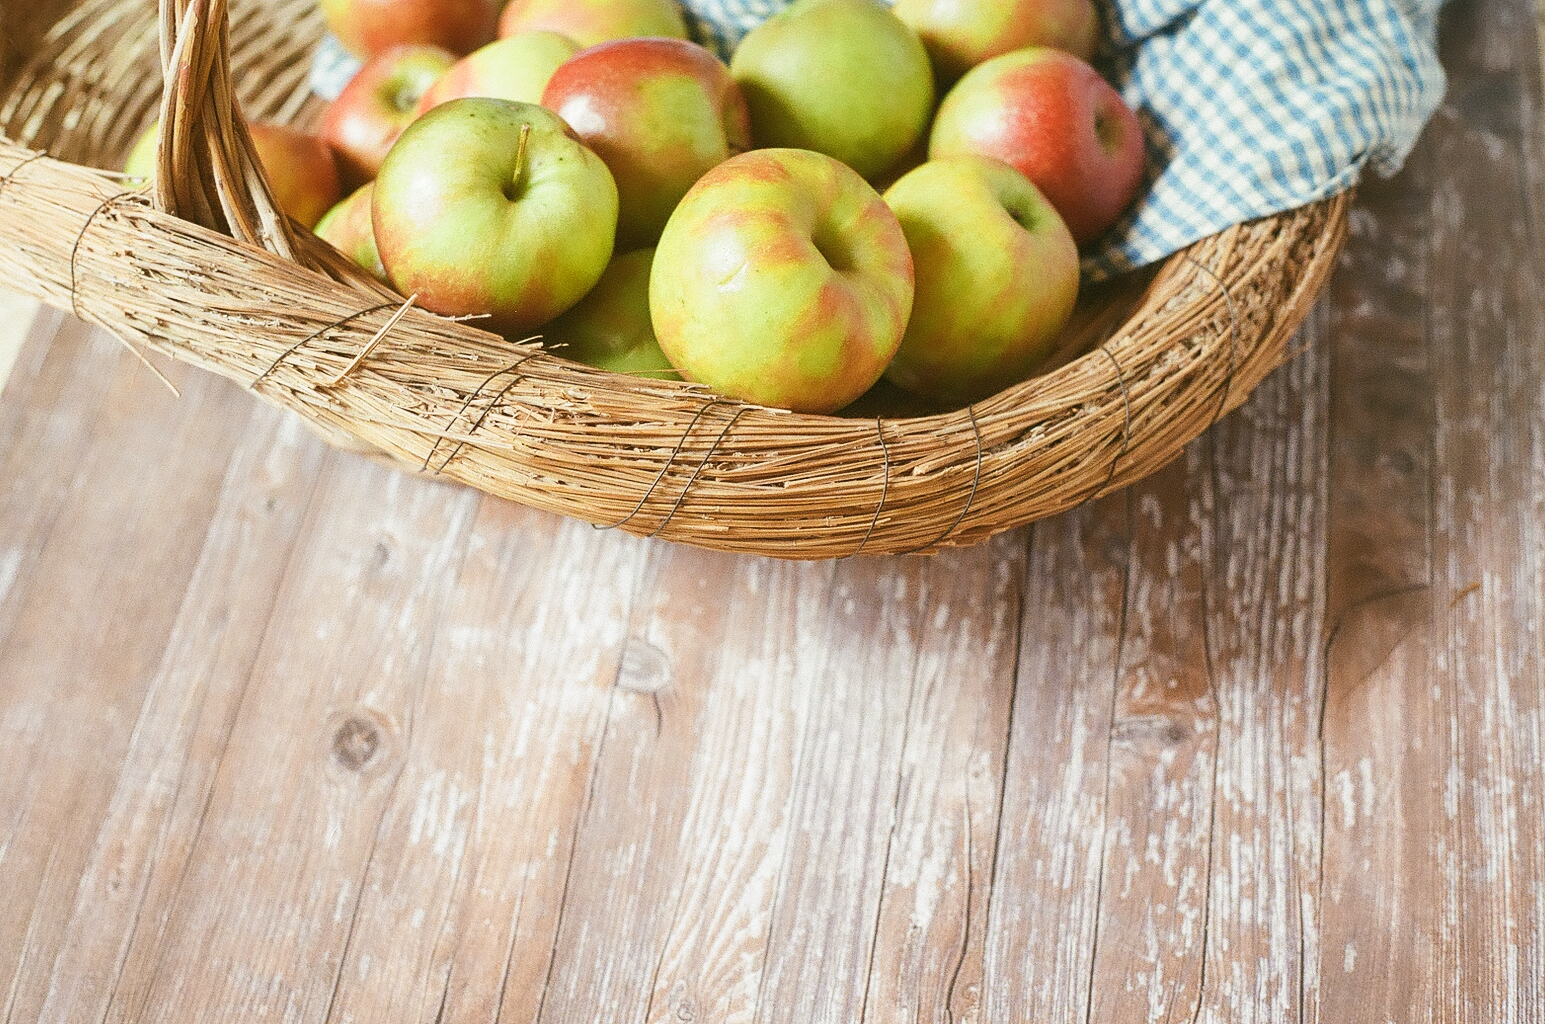 Apples Jona Prince